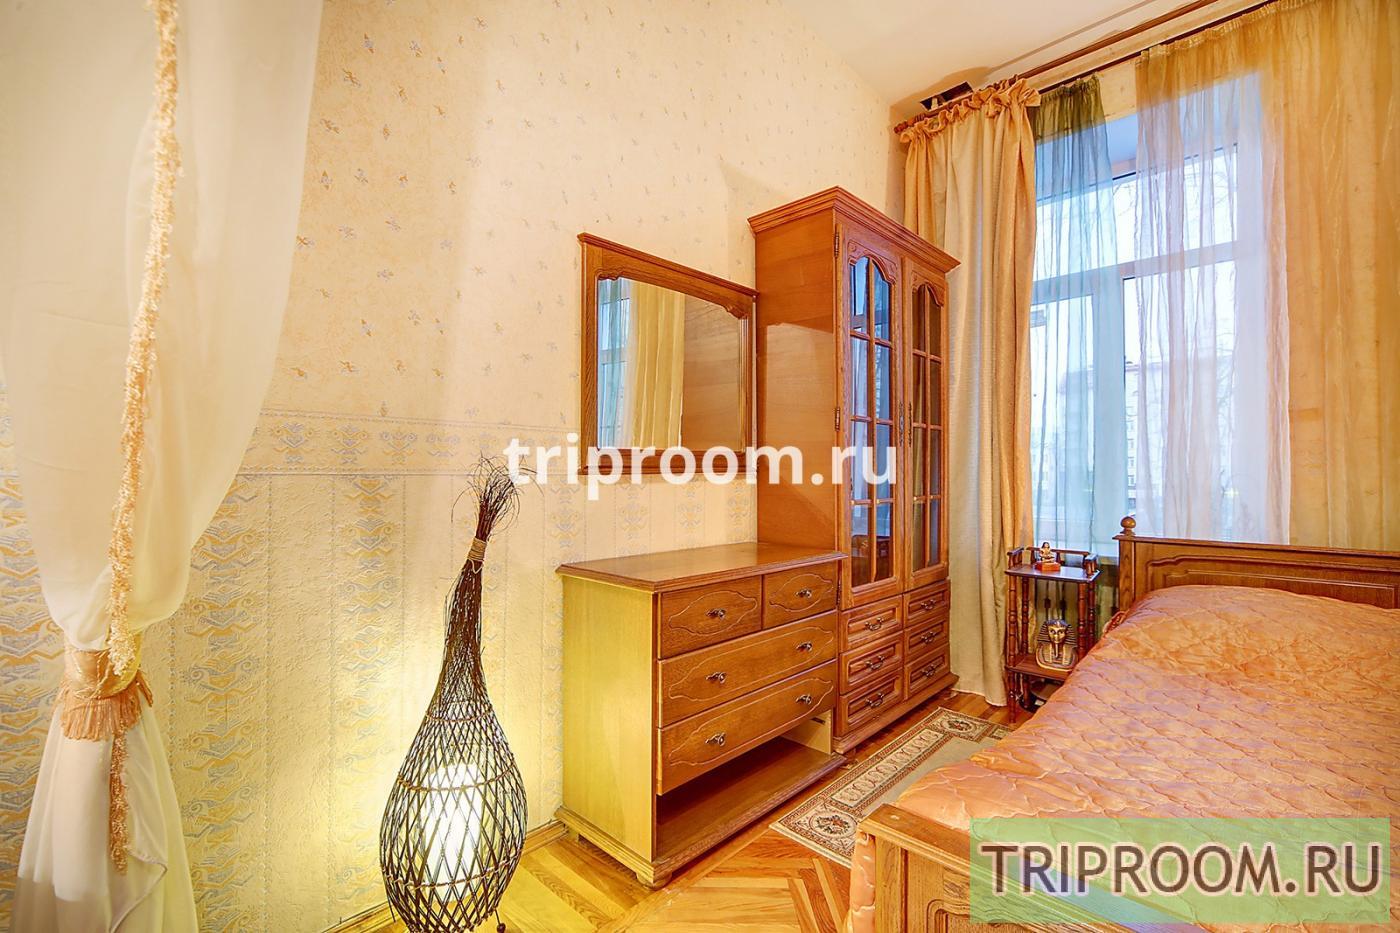 1-комнатная квартира посуточно (вариант № 15445), ул. Лиговский проспект, фото № 4